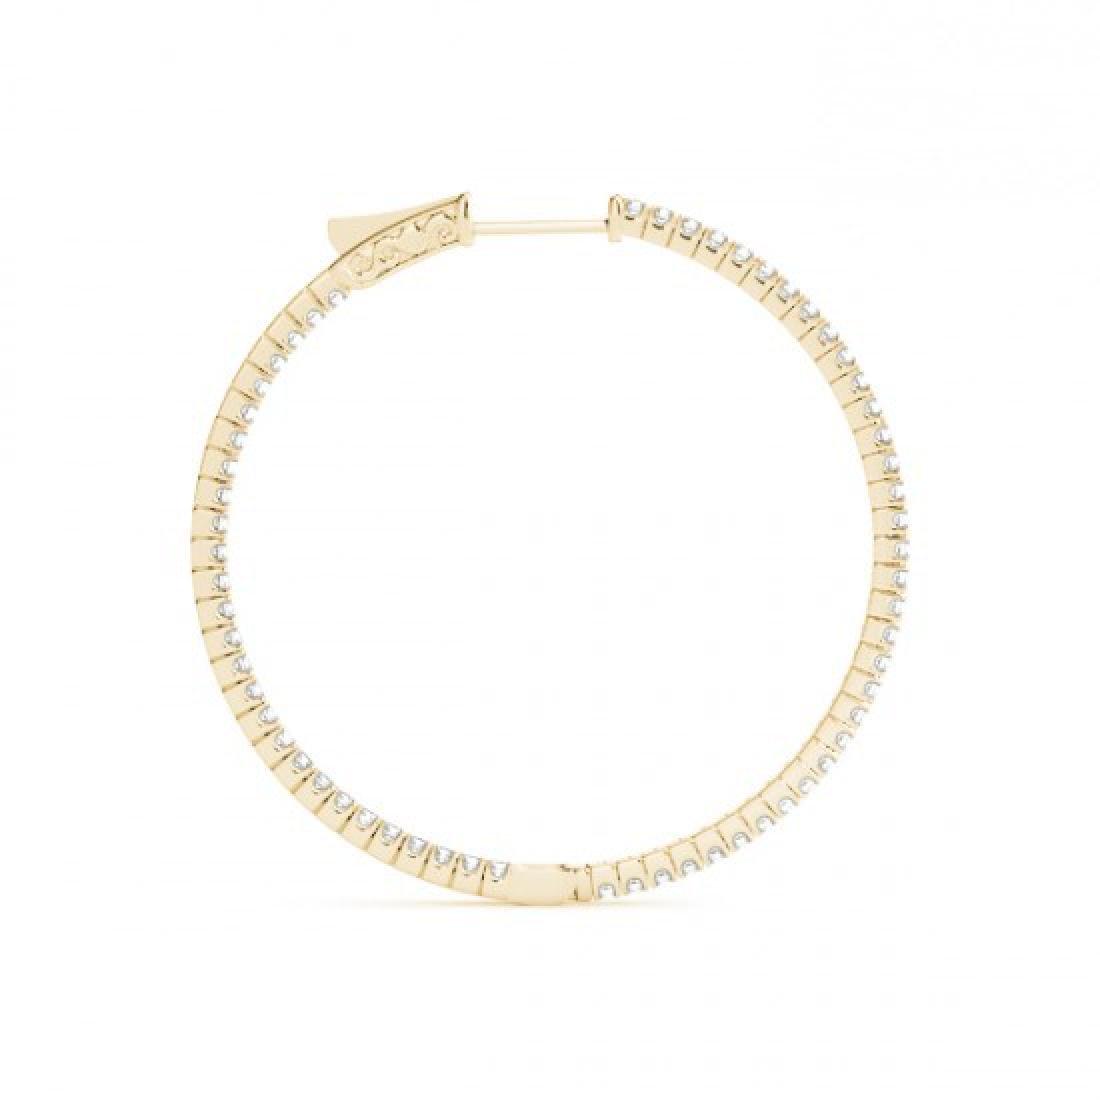 2 CTW Diamond VS/SI Certified 52 Mm Hoop Earrings 14K - 3